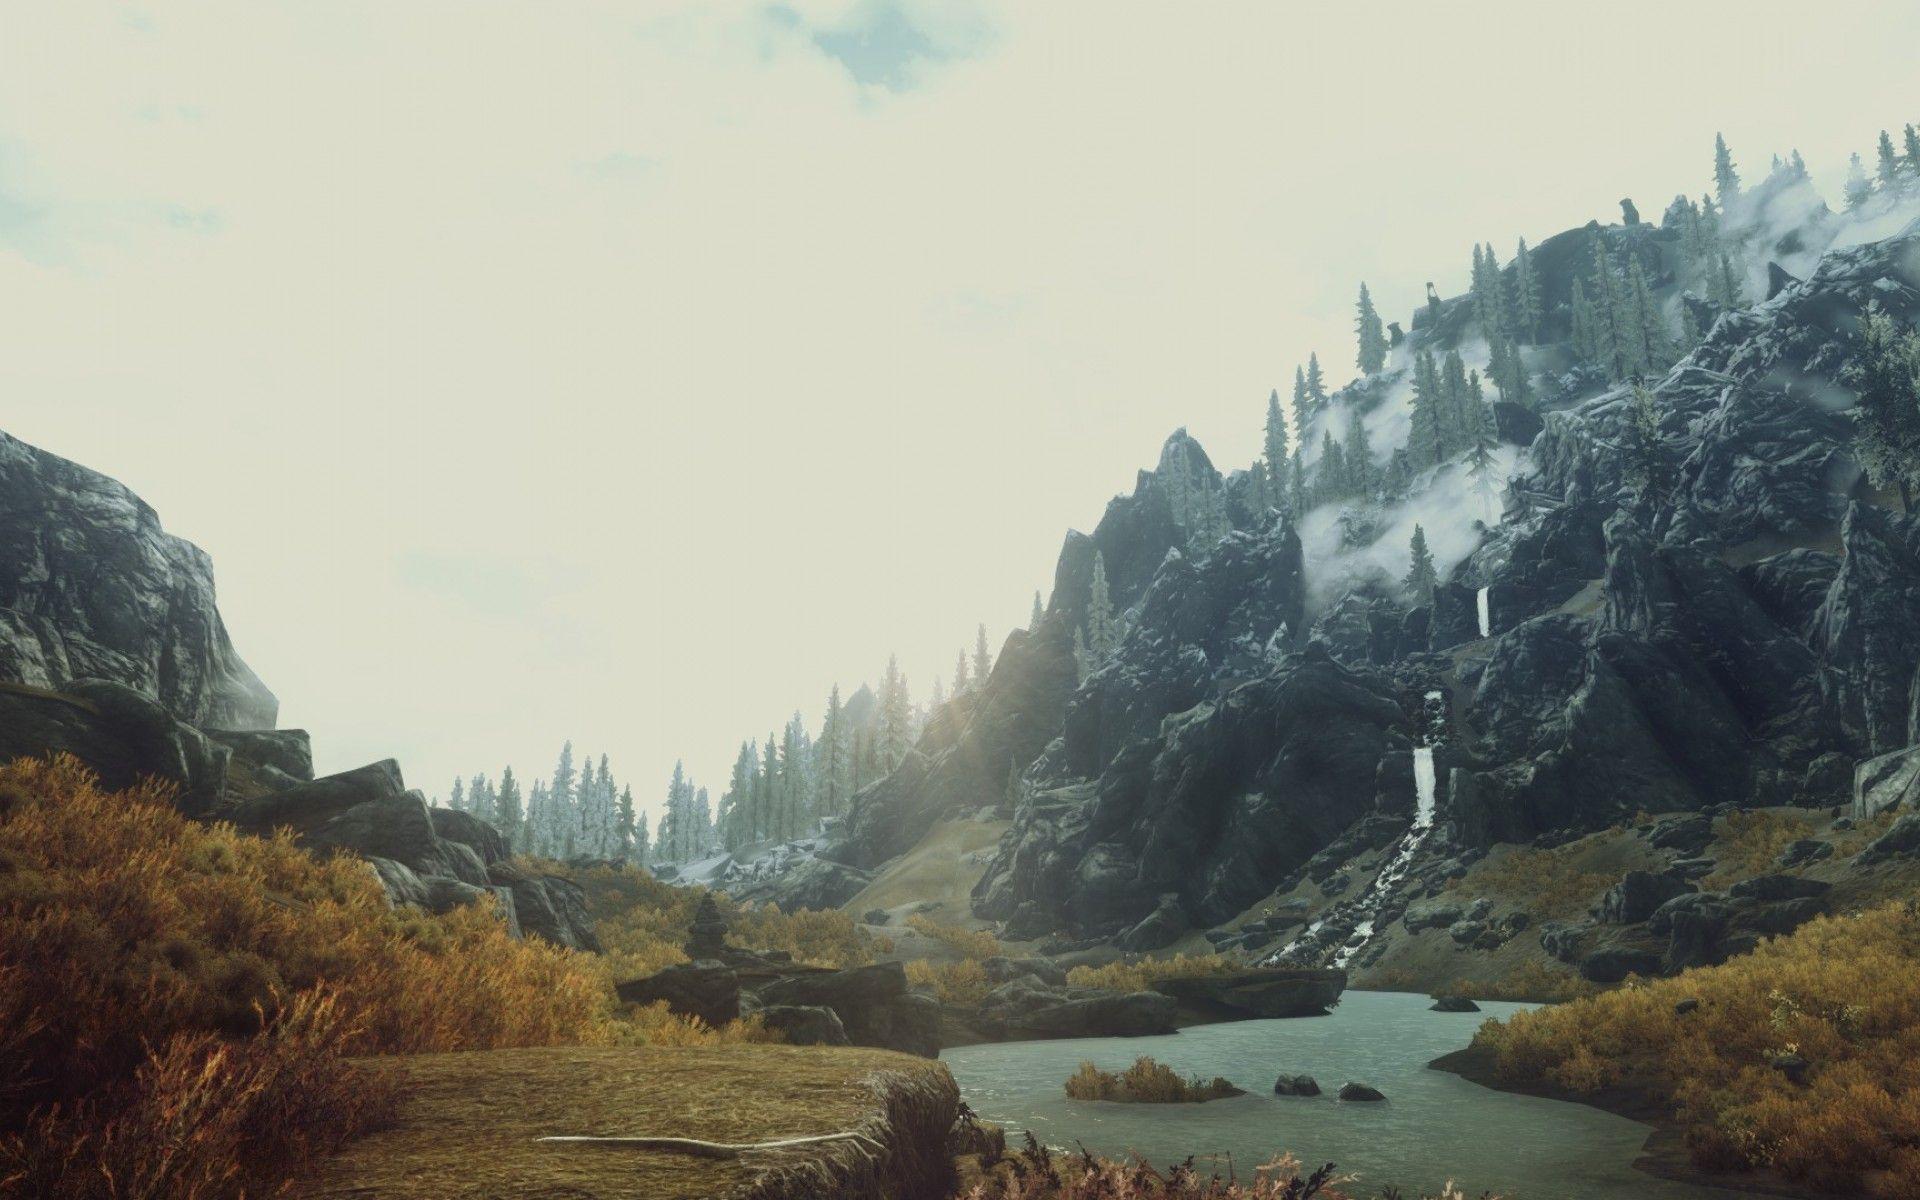 Download Skyrim Scenery Wallpaper Hd Backgrounds Download